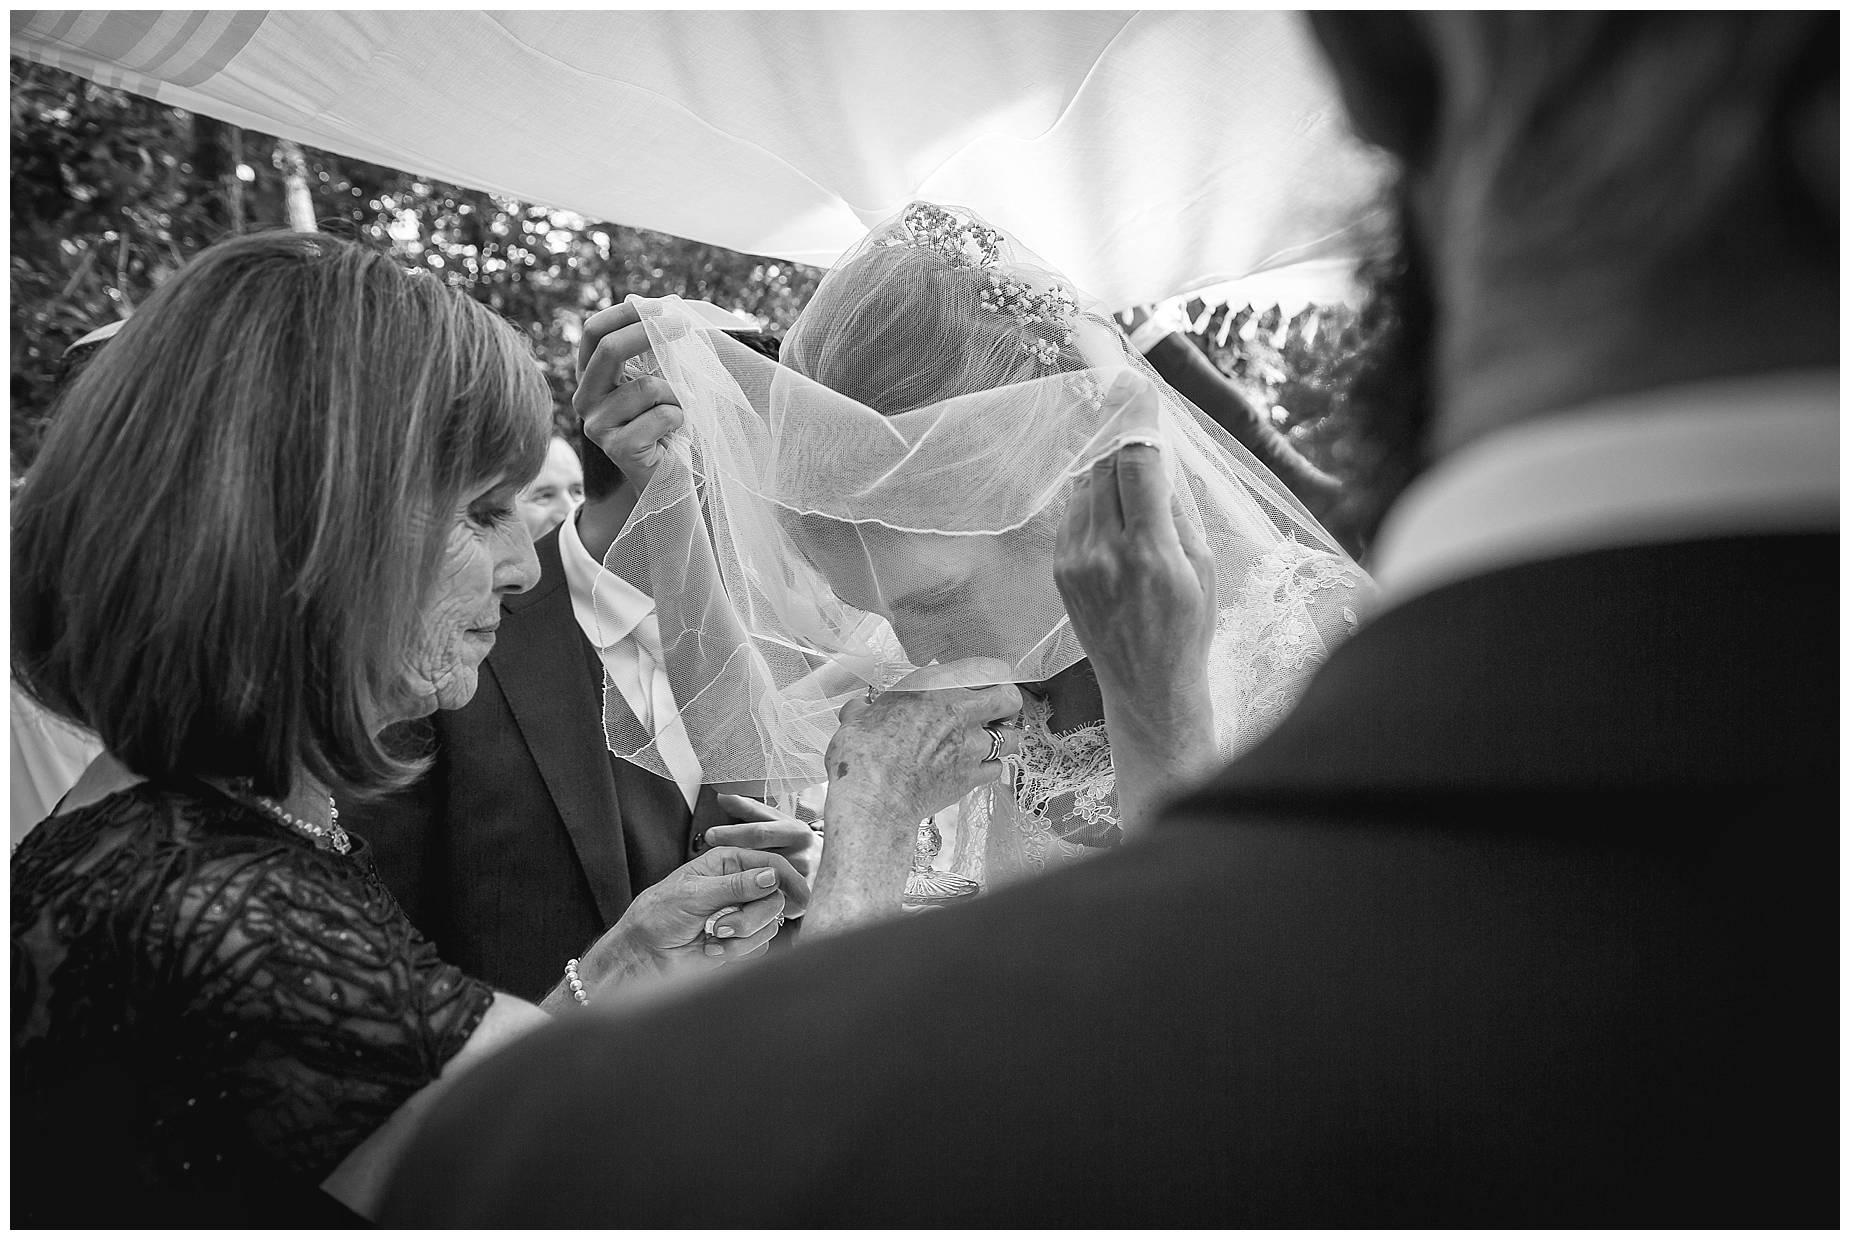 bride takes sip of wine